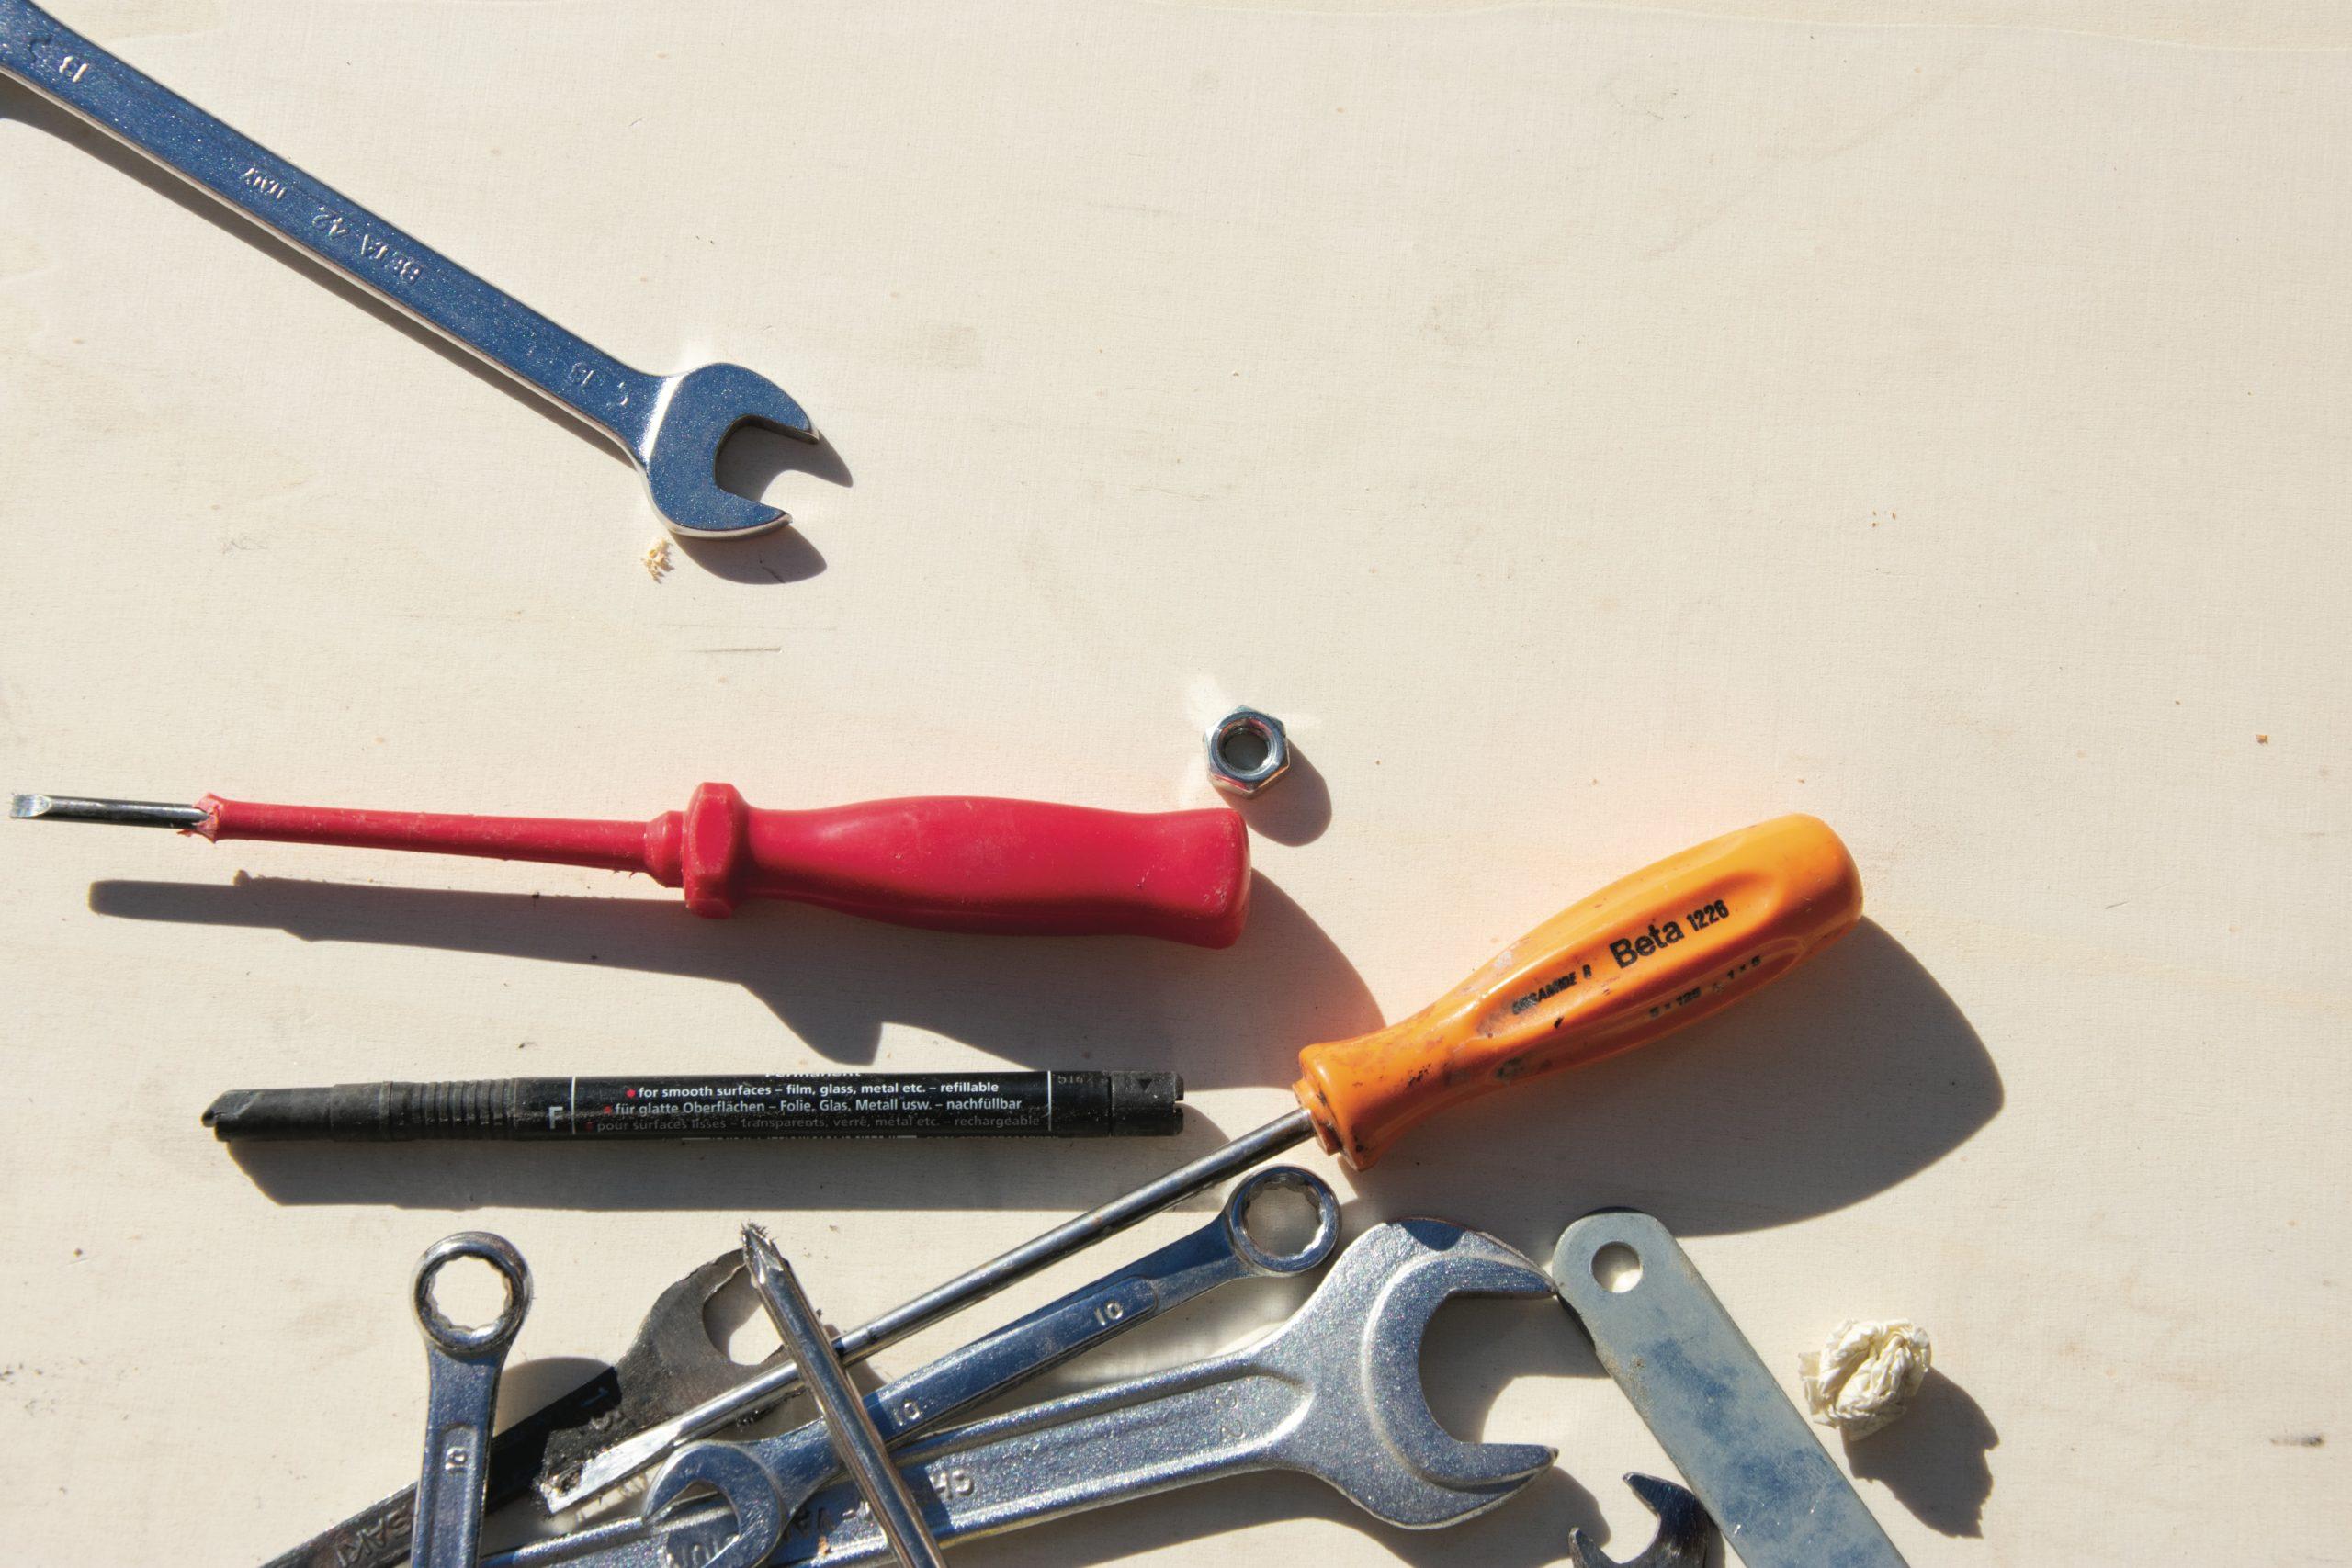 generic photo of tools